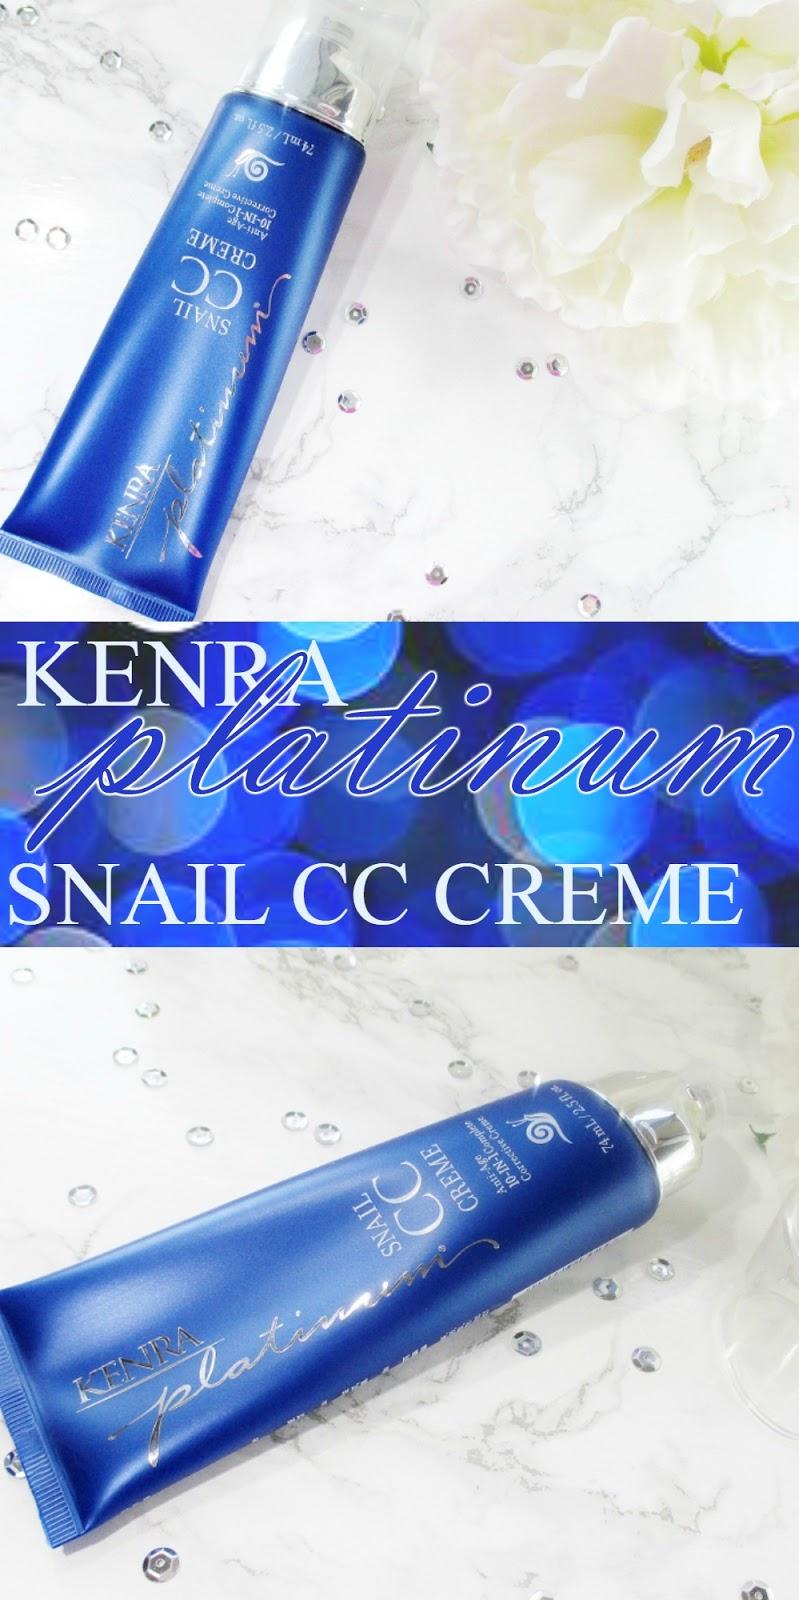 kenra-platinum-snail-cc-creme-3